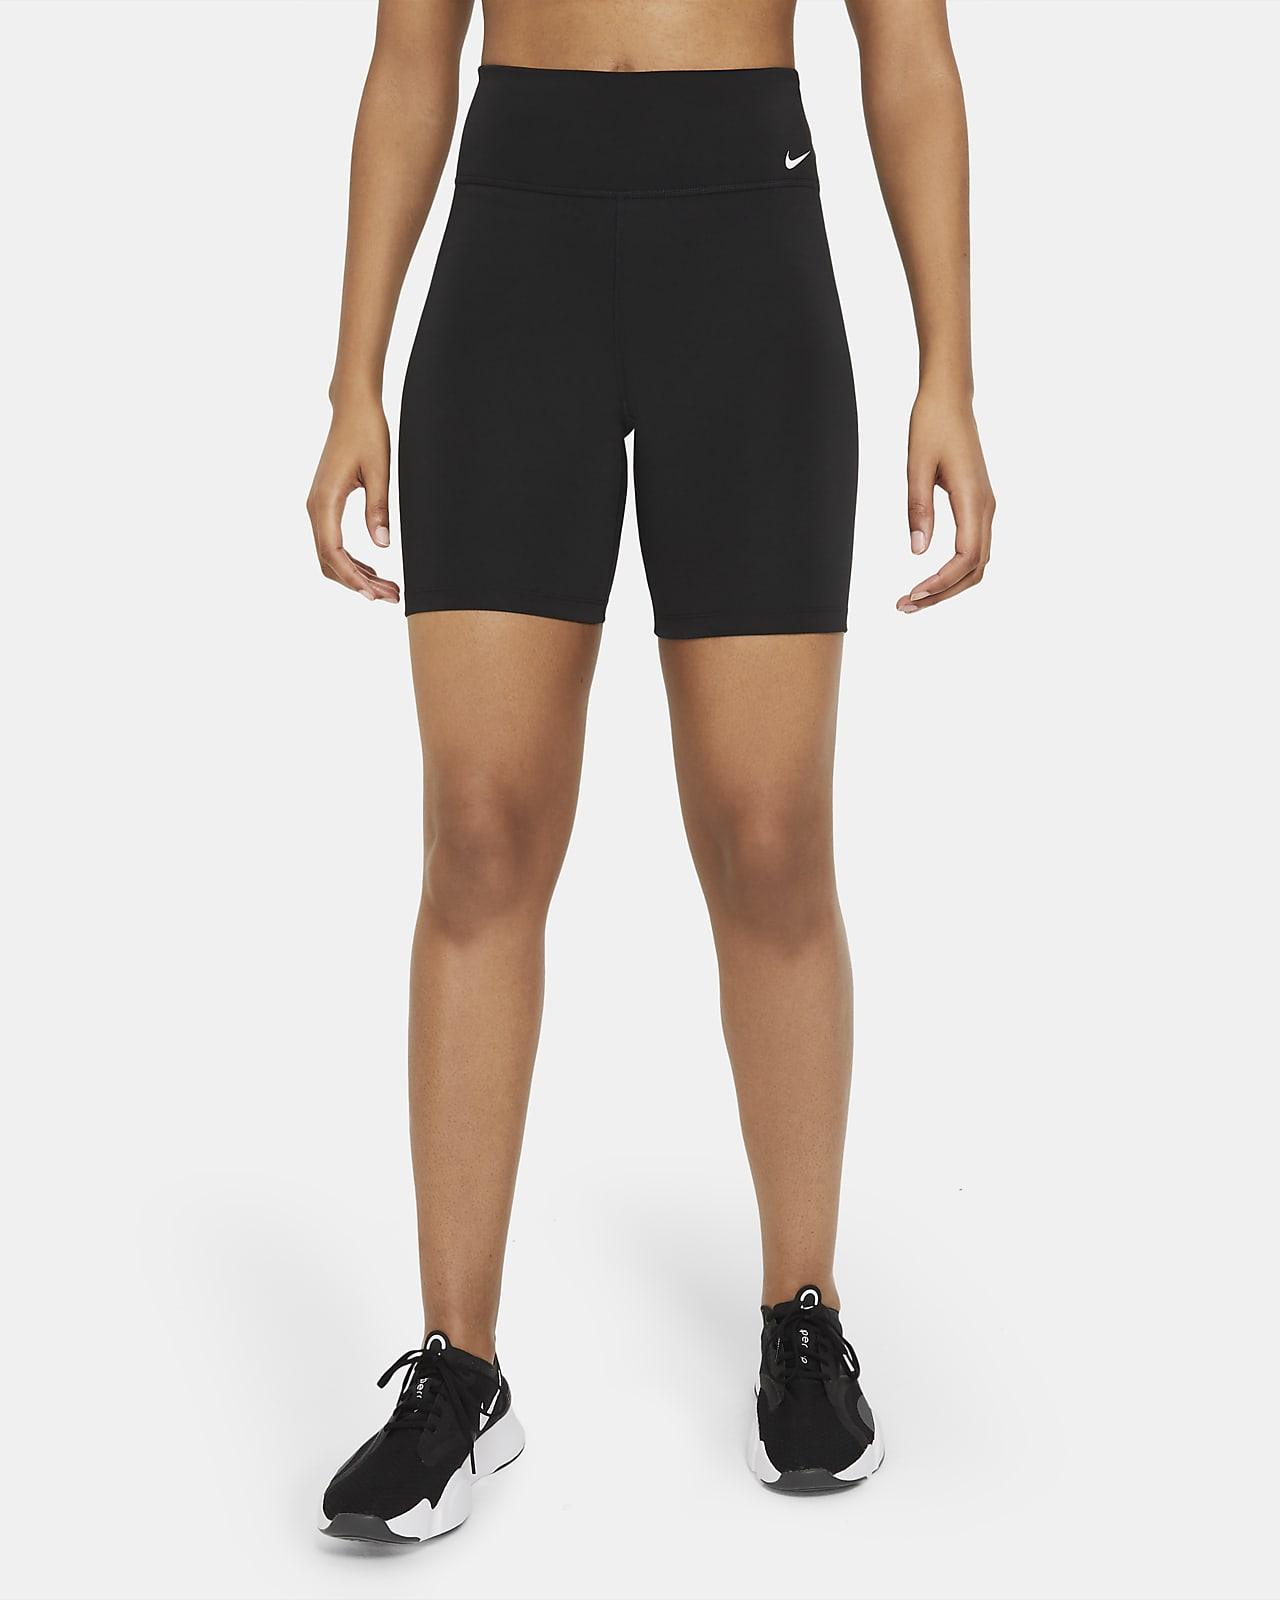 Nike One Damen-Shorts mit mittelhohem Bund (ca. 18 cm)